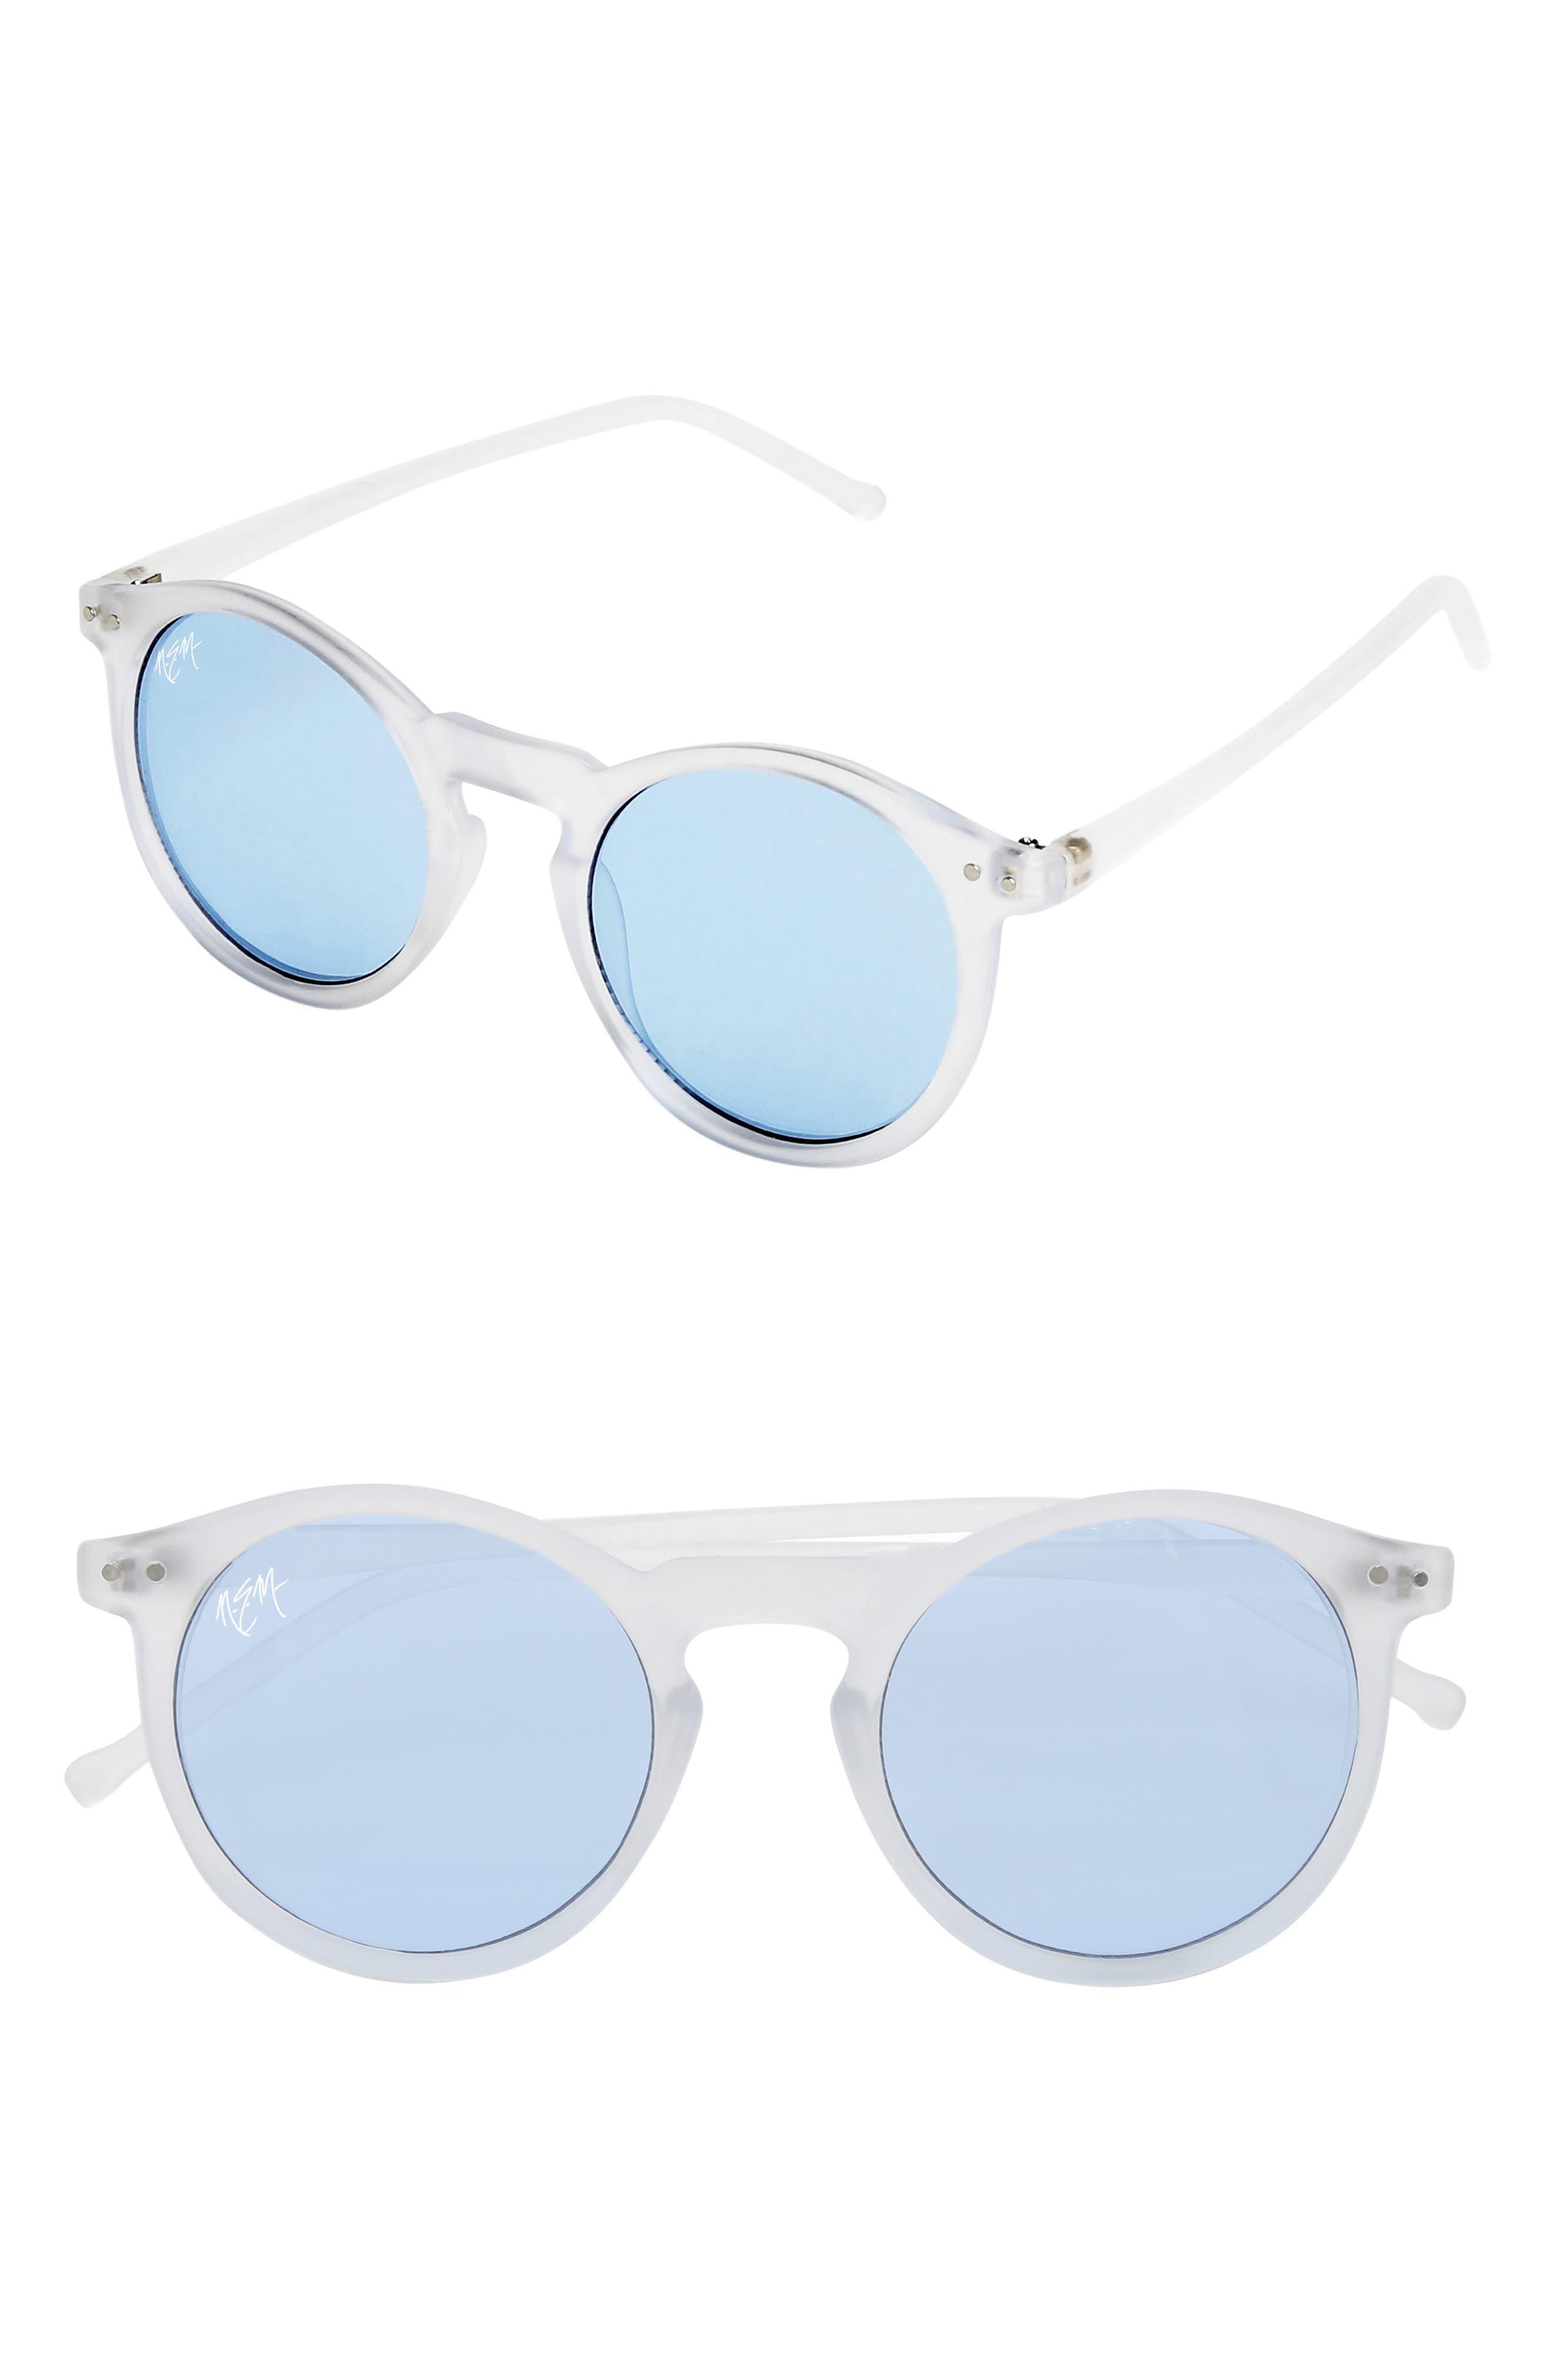 Nem 50Mm Mirrored Round Sunglasses - Clear Sky Blue/ Blue Tint